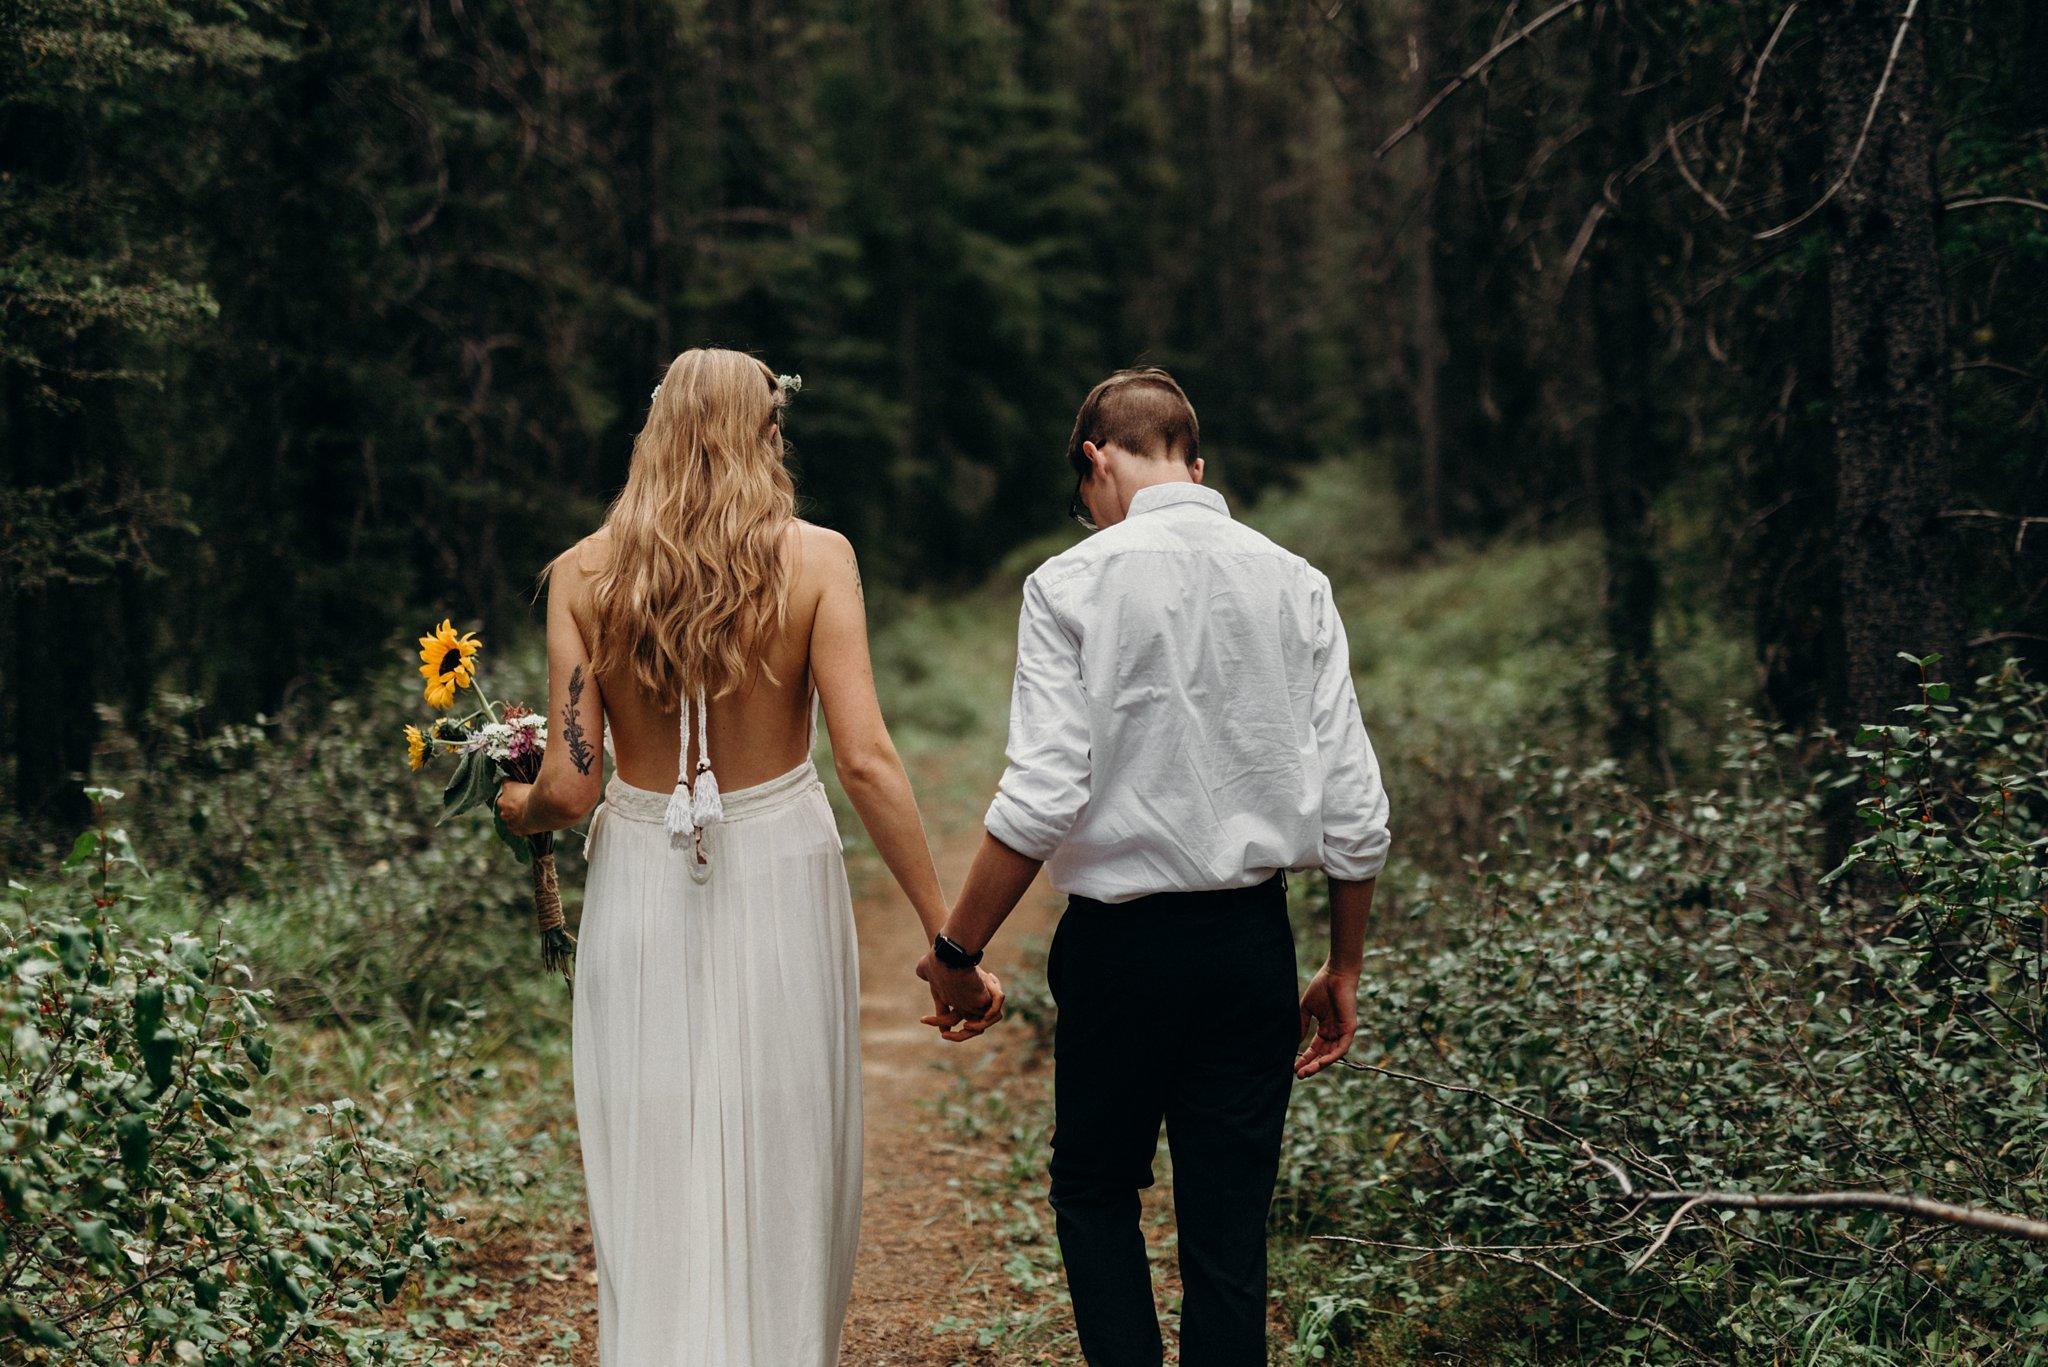 kaihla_tonai_intimate_wedding_elopement_photographer_6367.jpg